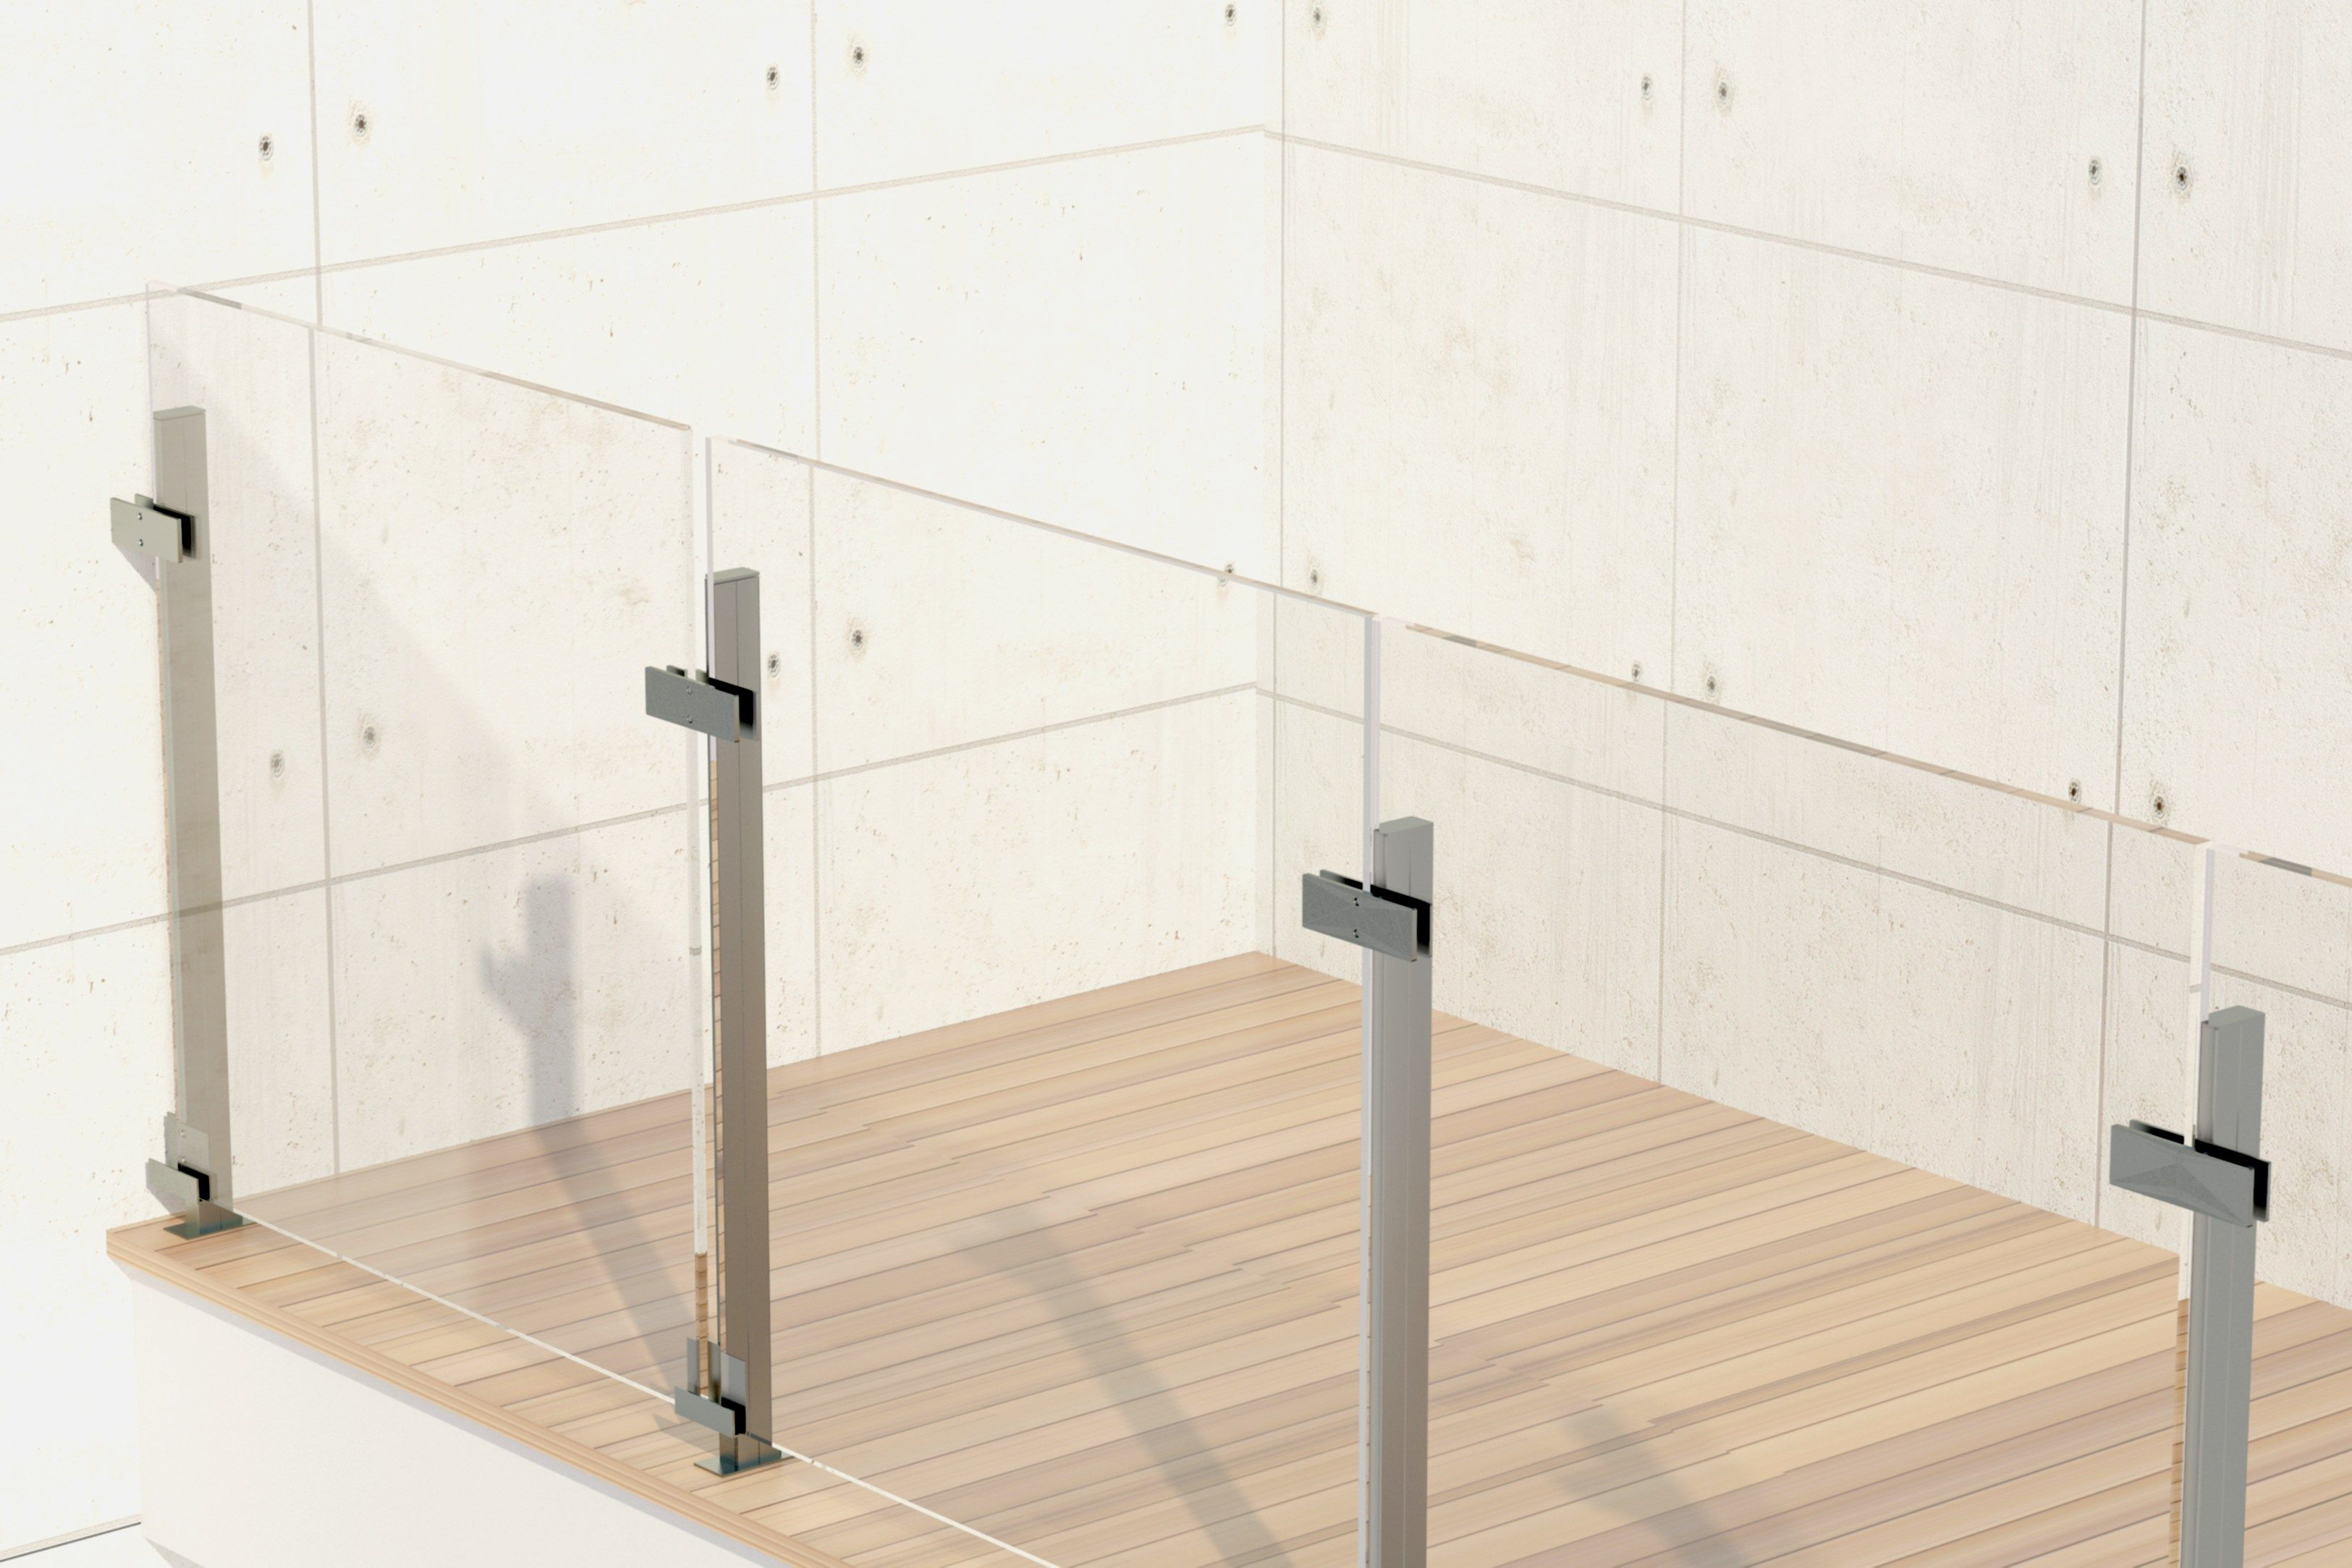 Resultado de imagen para barandas para balcones de vidrio   barandas ...